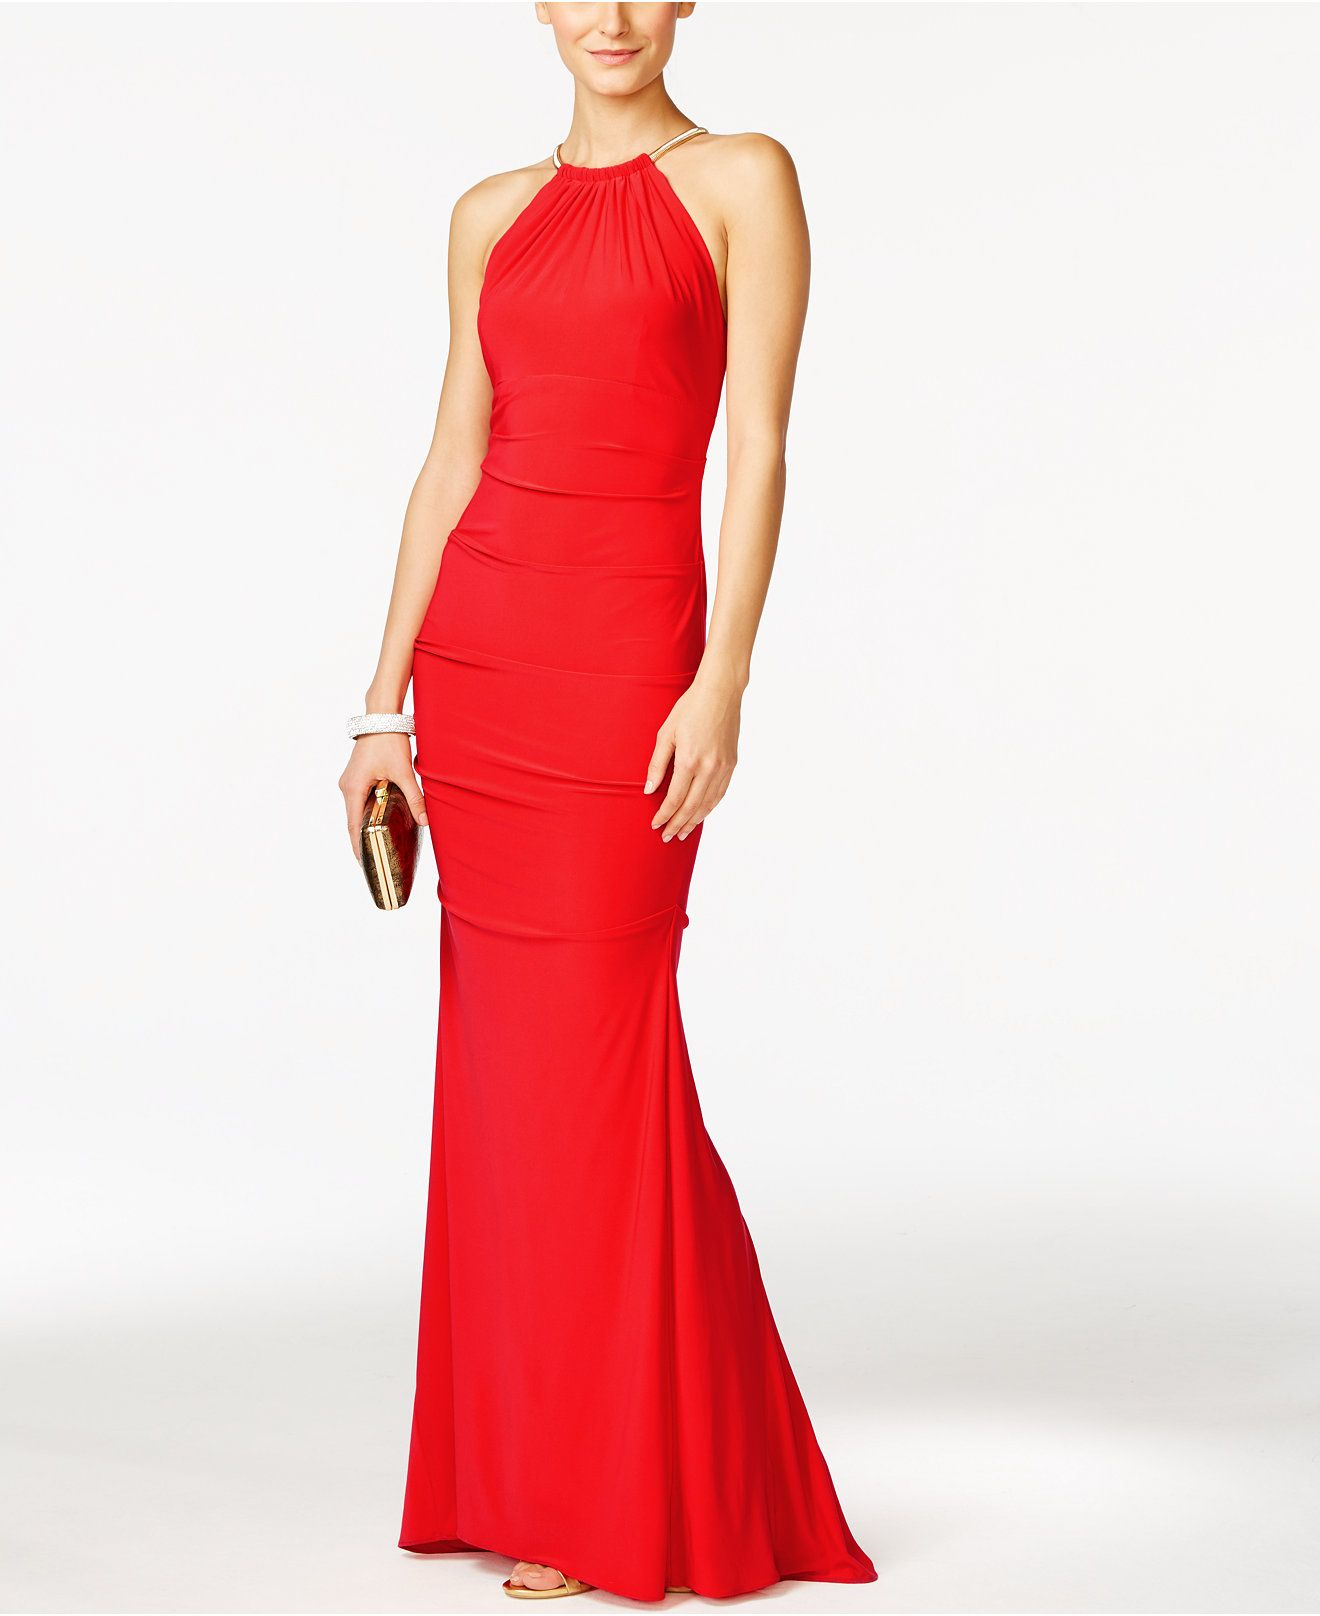 Red Halter Prom Dress Macy's